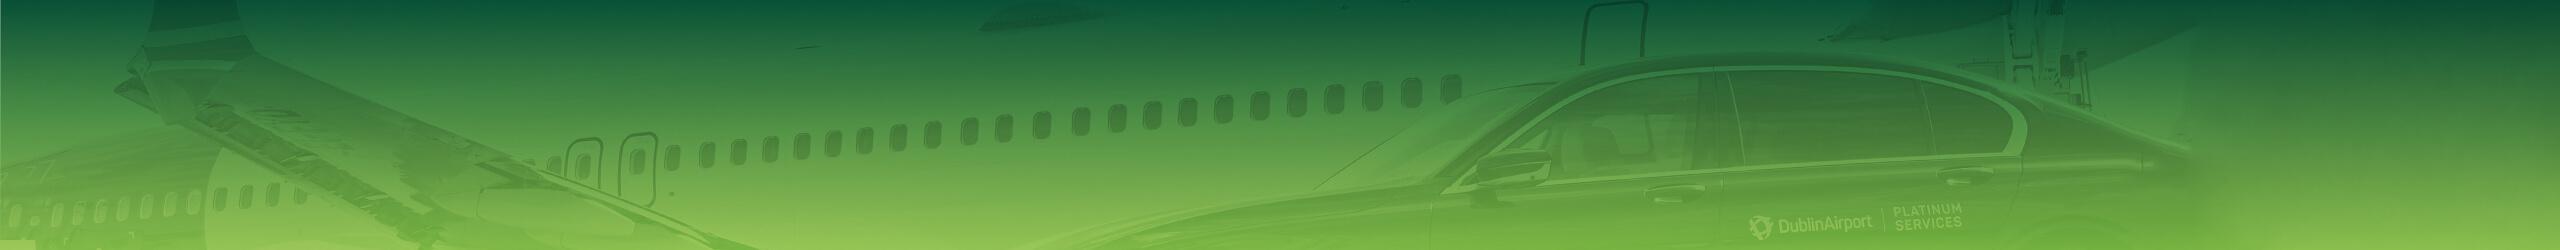 Platinum chauffeured car beside plane